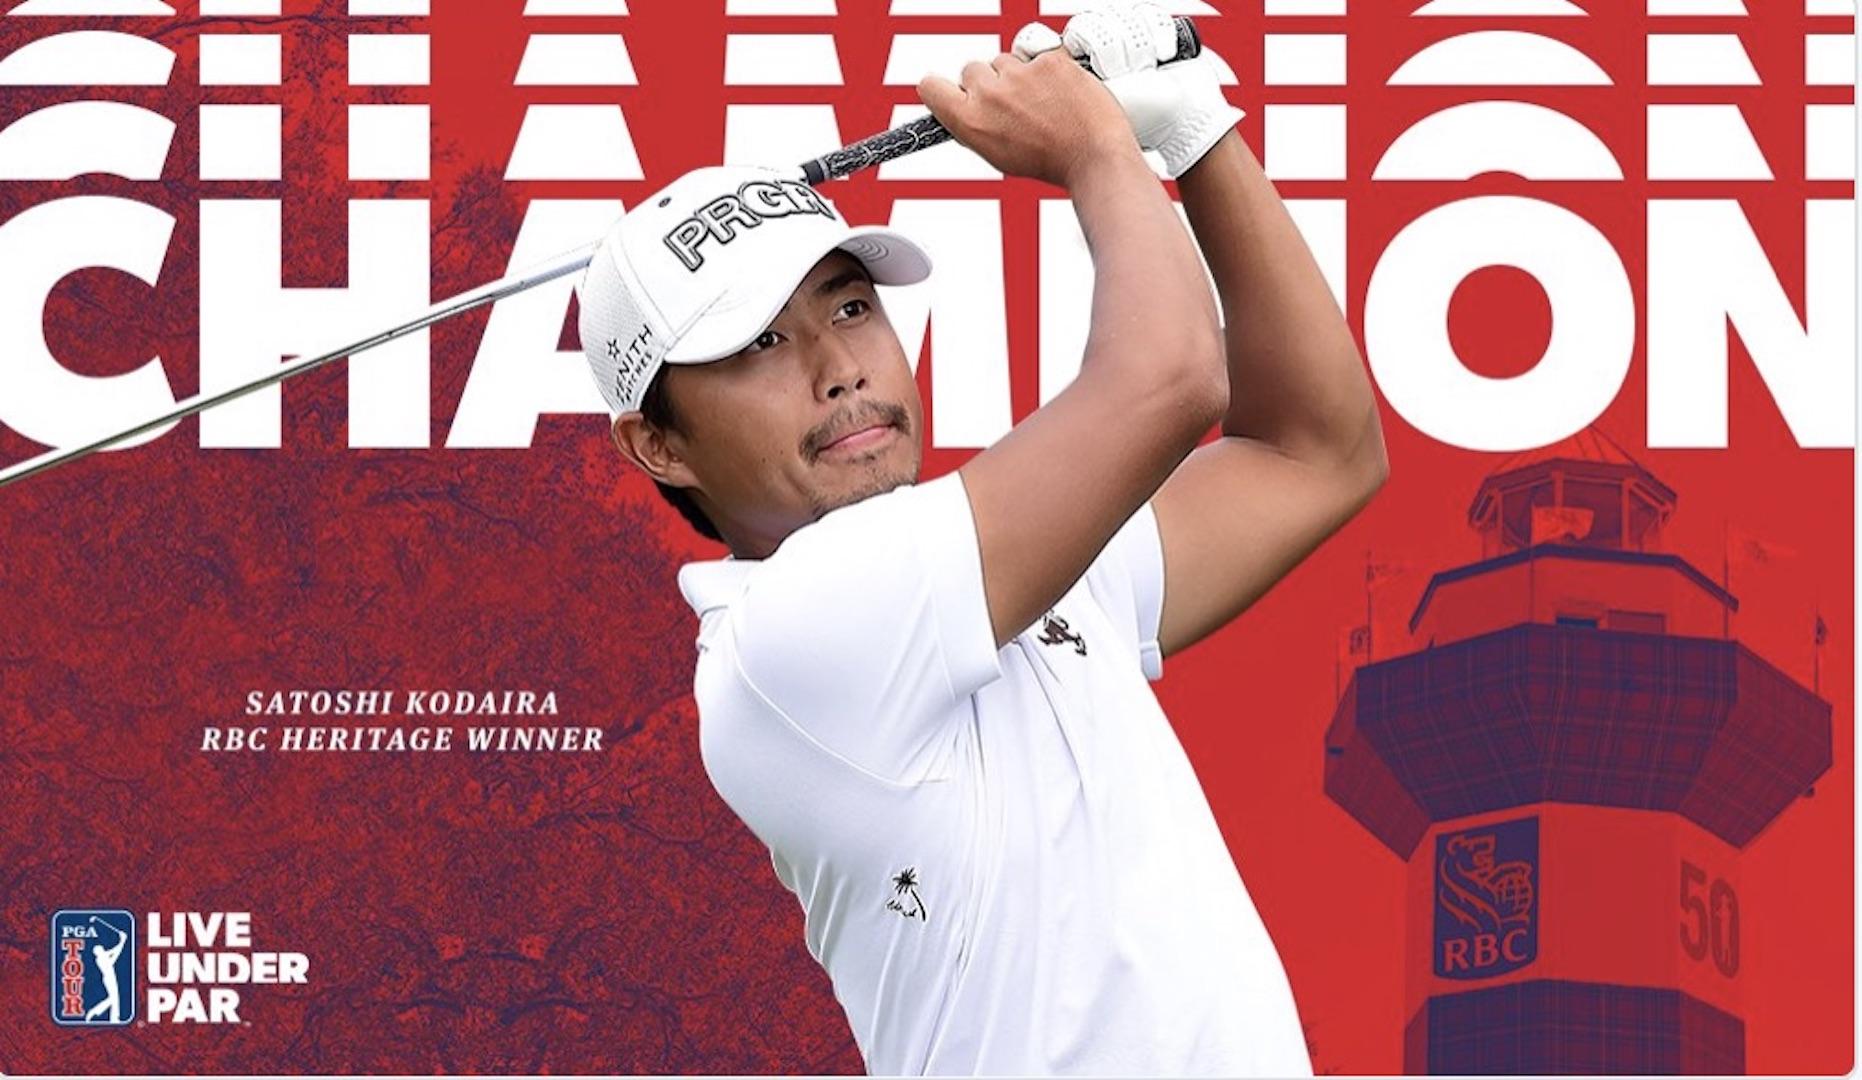 Satoshi Kodaira wins RBC Heritage in 15th ever start